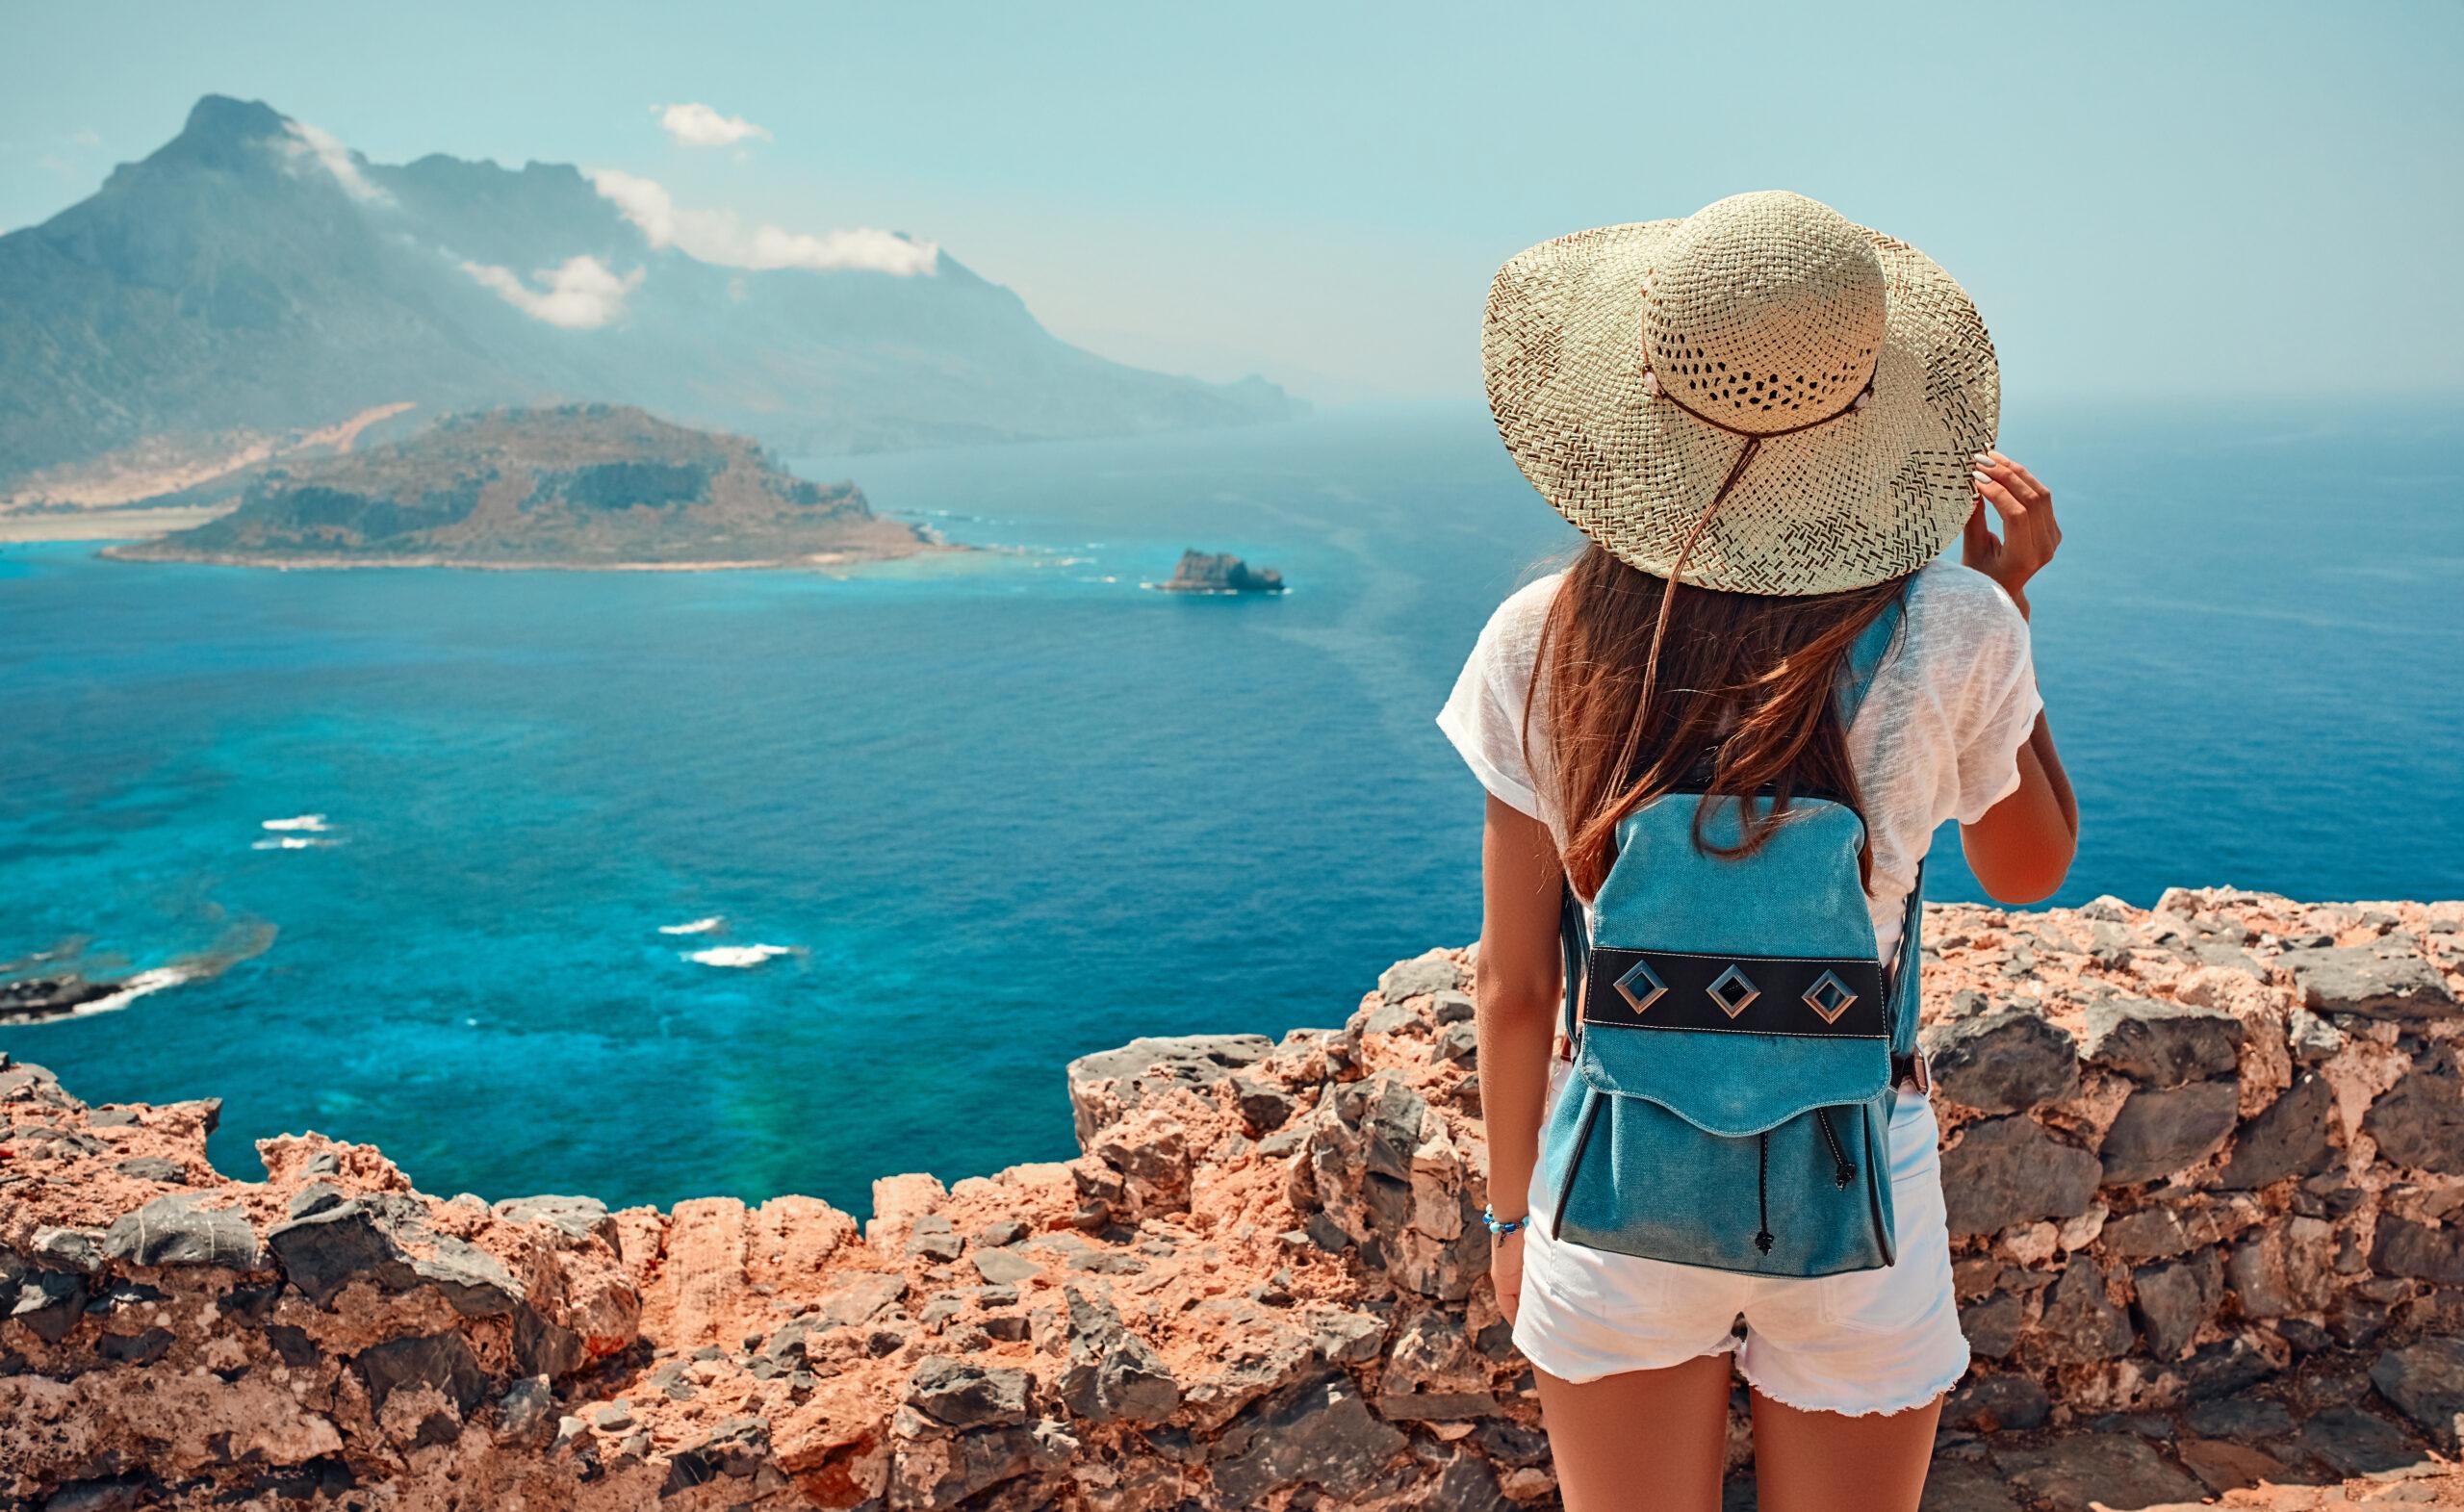 Wellbeing - Travel